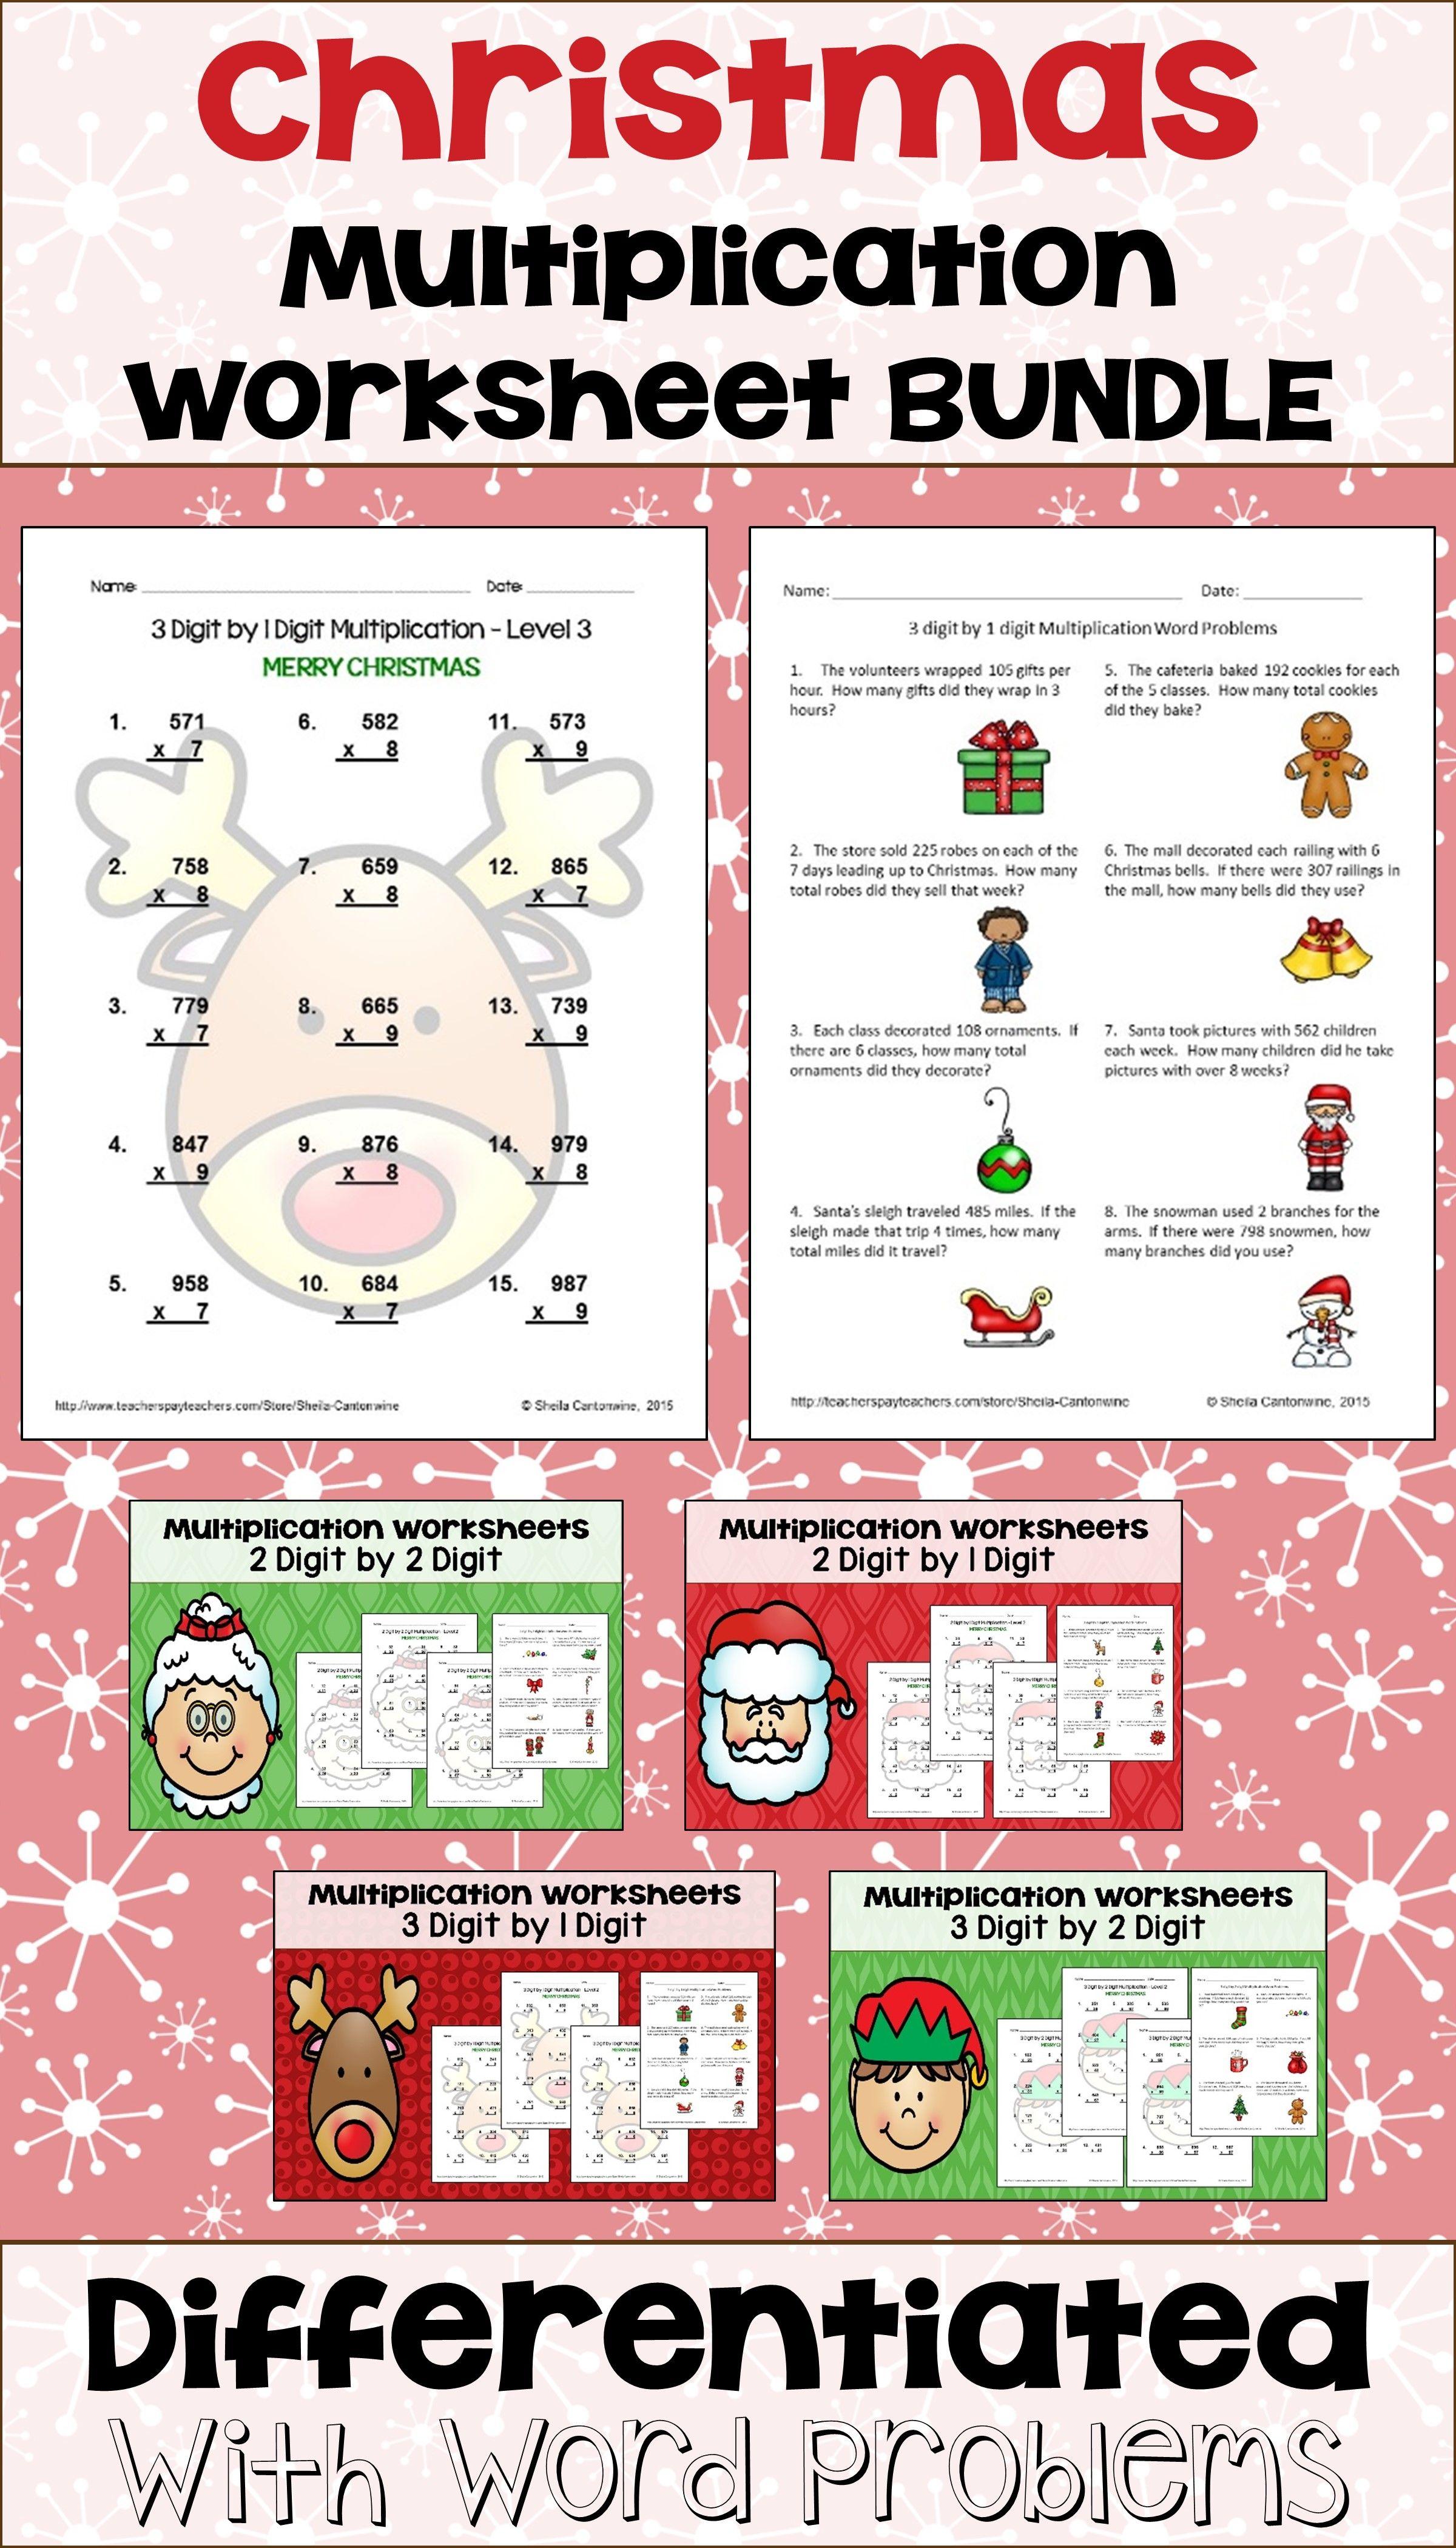 Christmas Multiplication Worksheet Bundle With Word